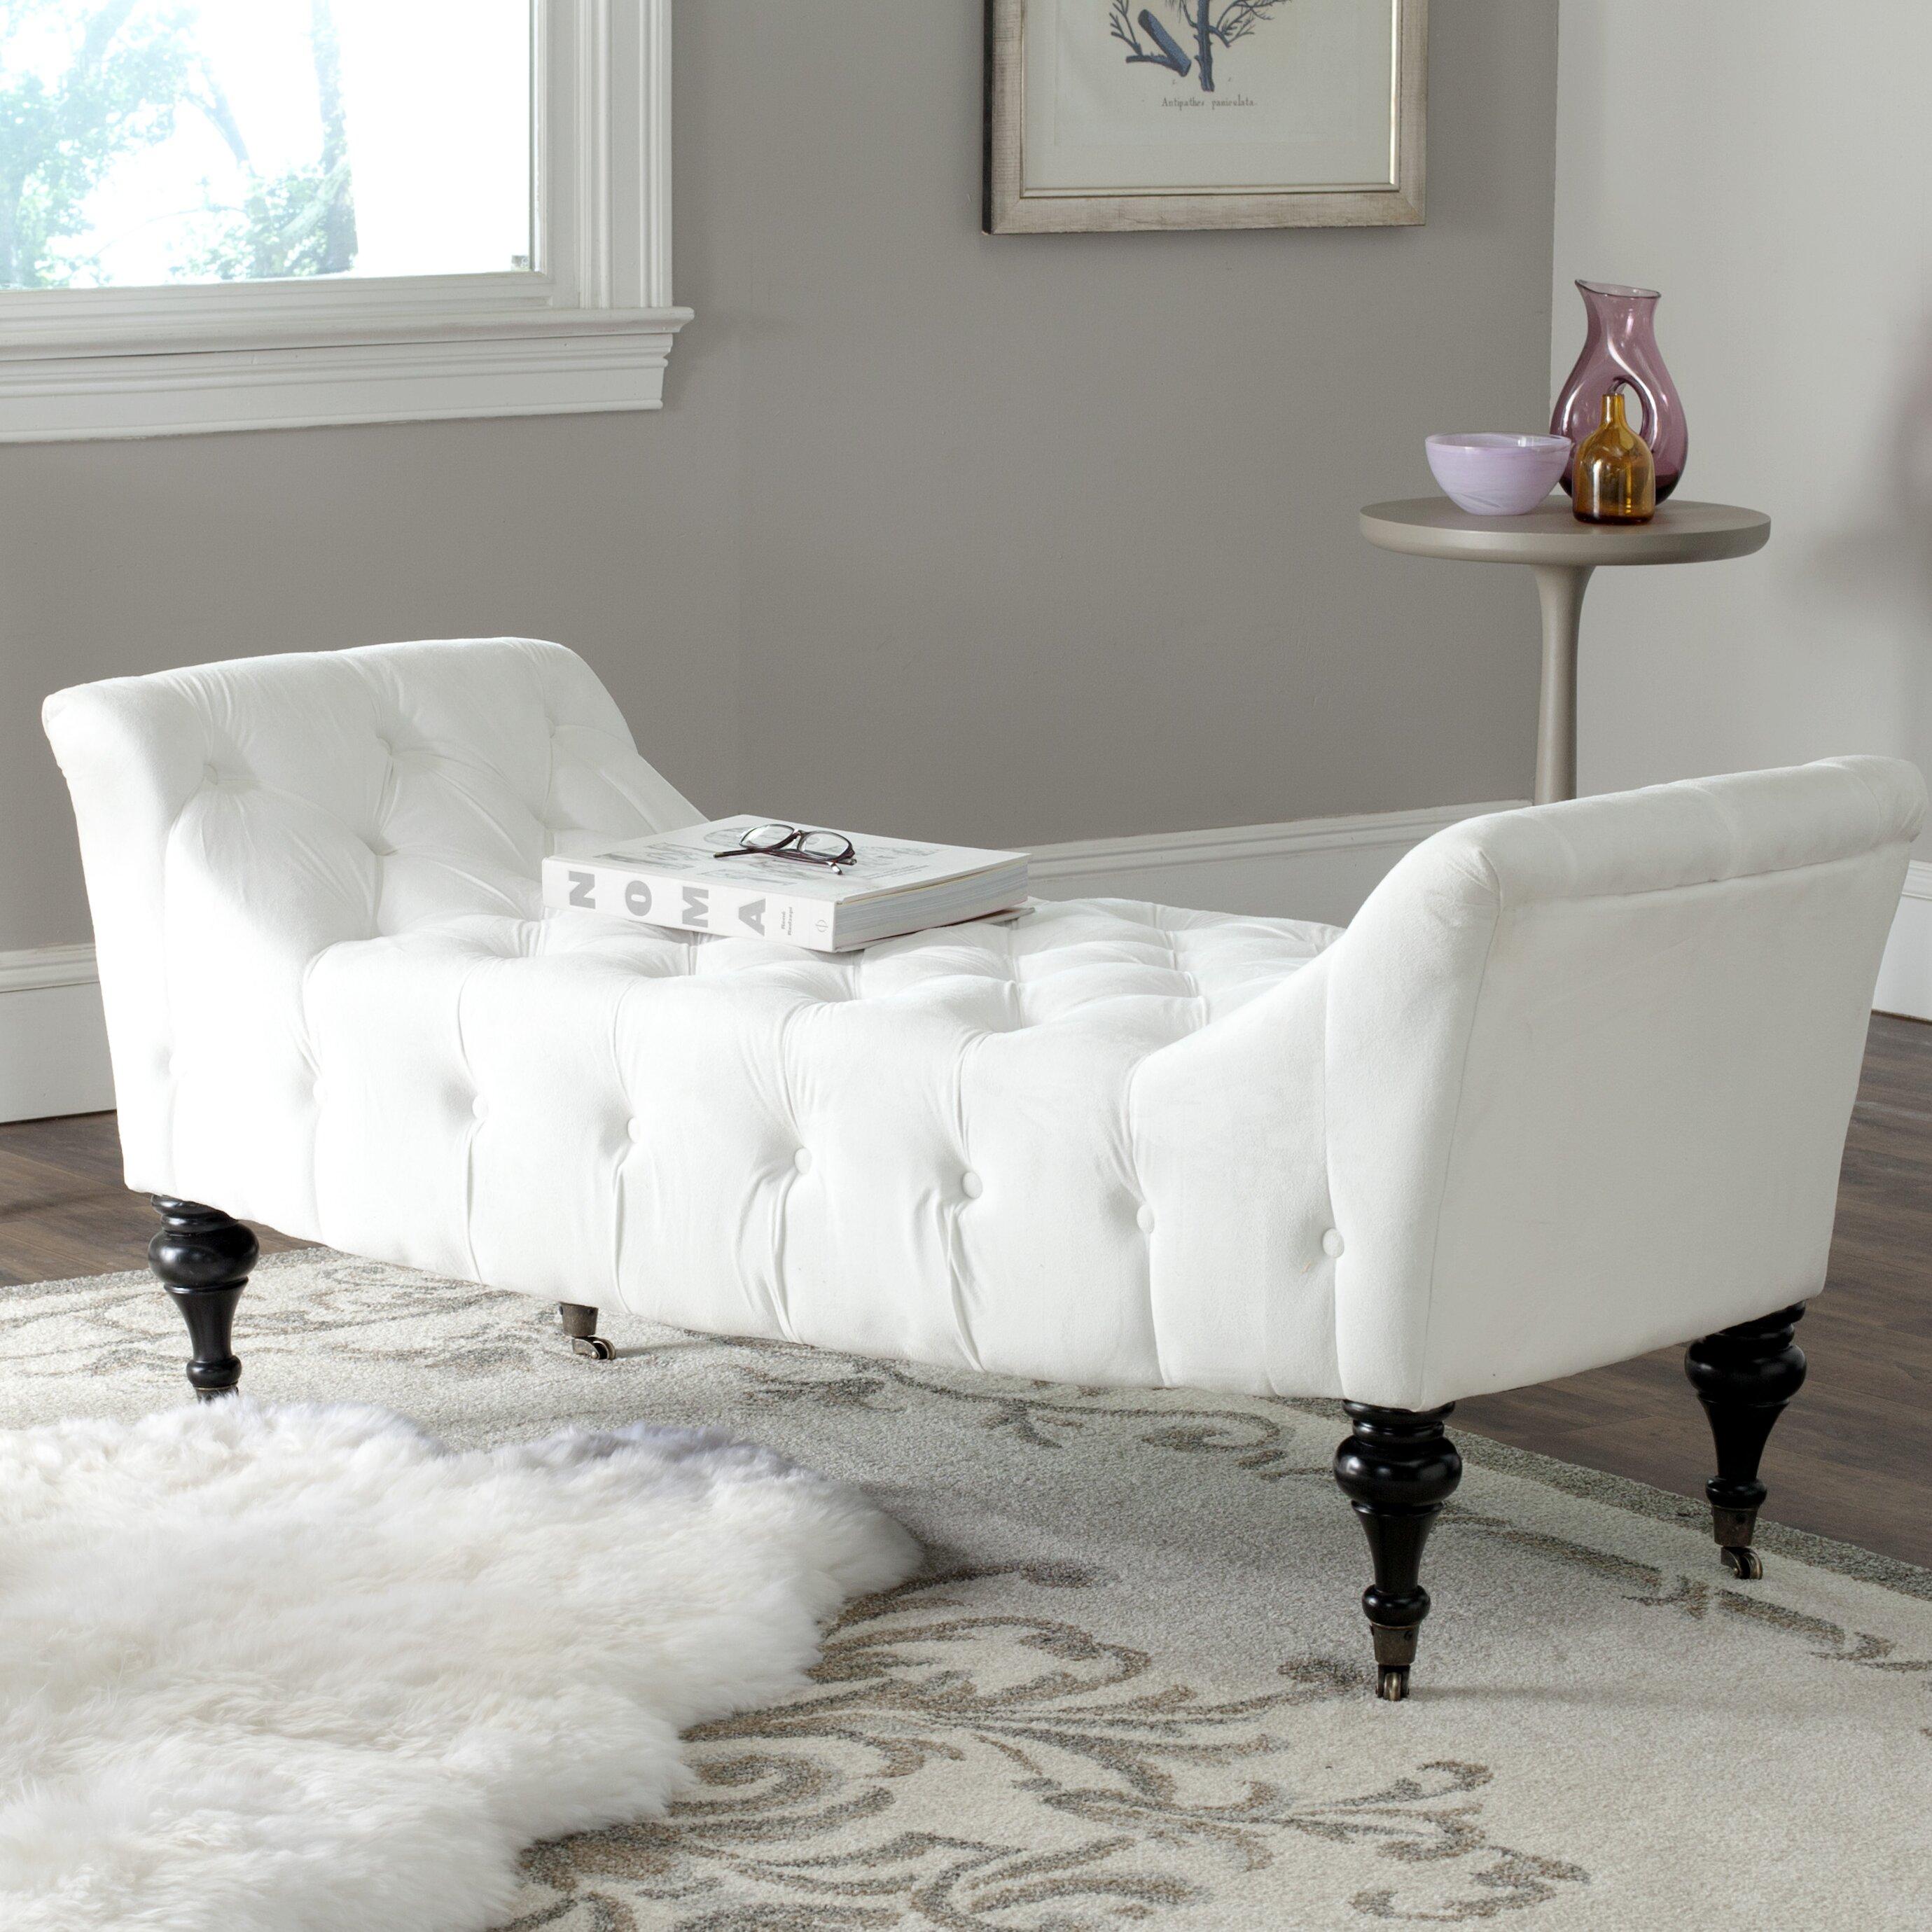 Safavieh Wood Bedroom Bench & Reviews